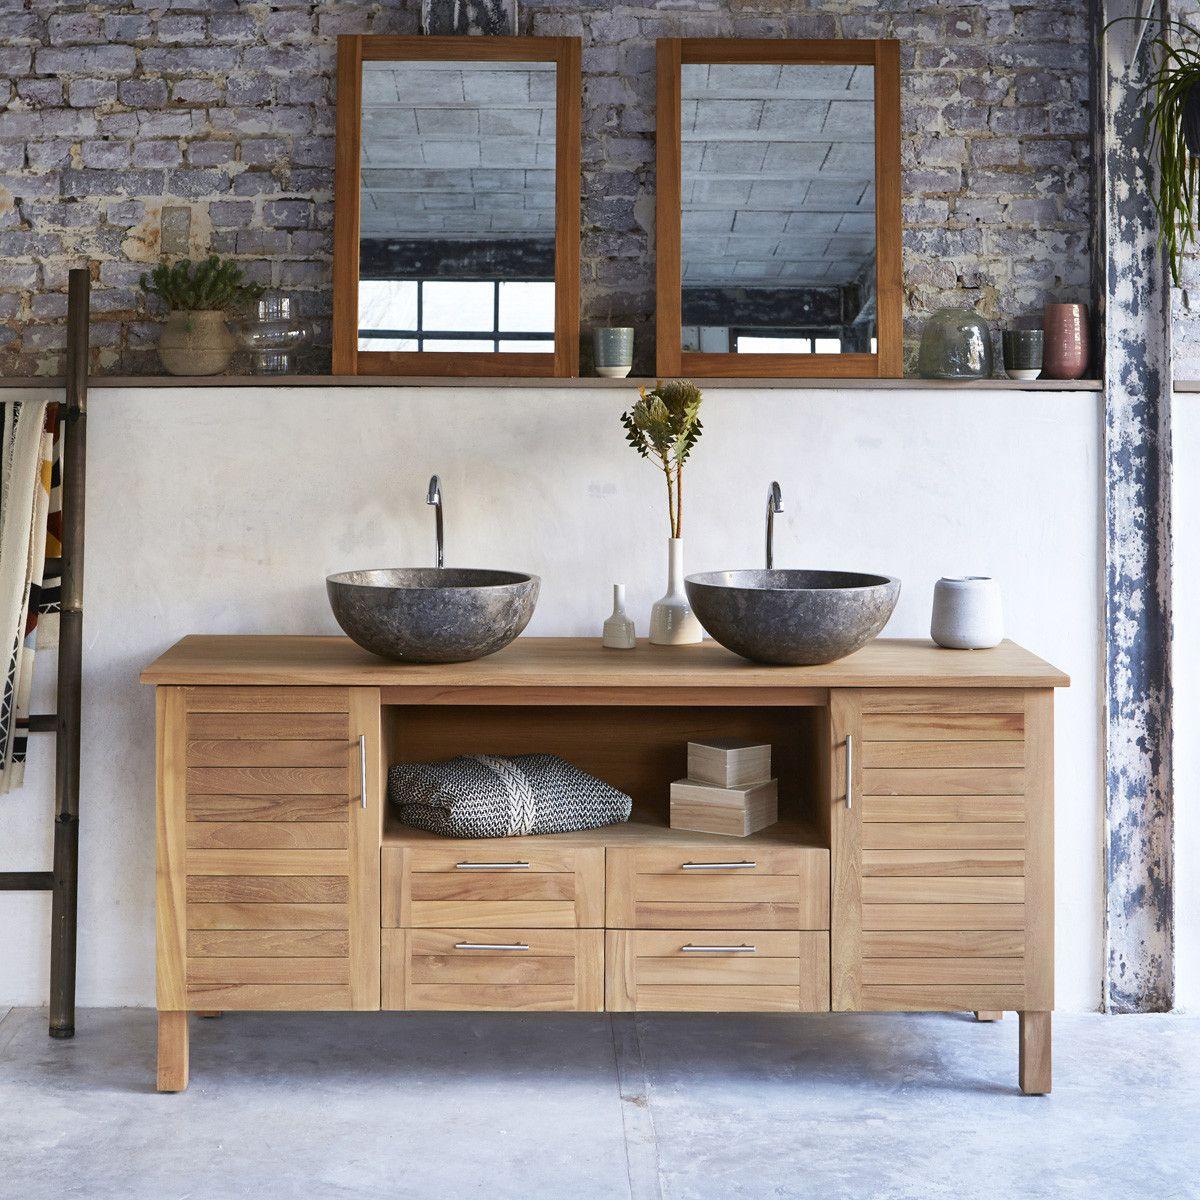 Photo of Solid Teak Wood Vanity Cabinet Wash Stand Large Size for 2 Basins Bathroom